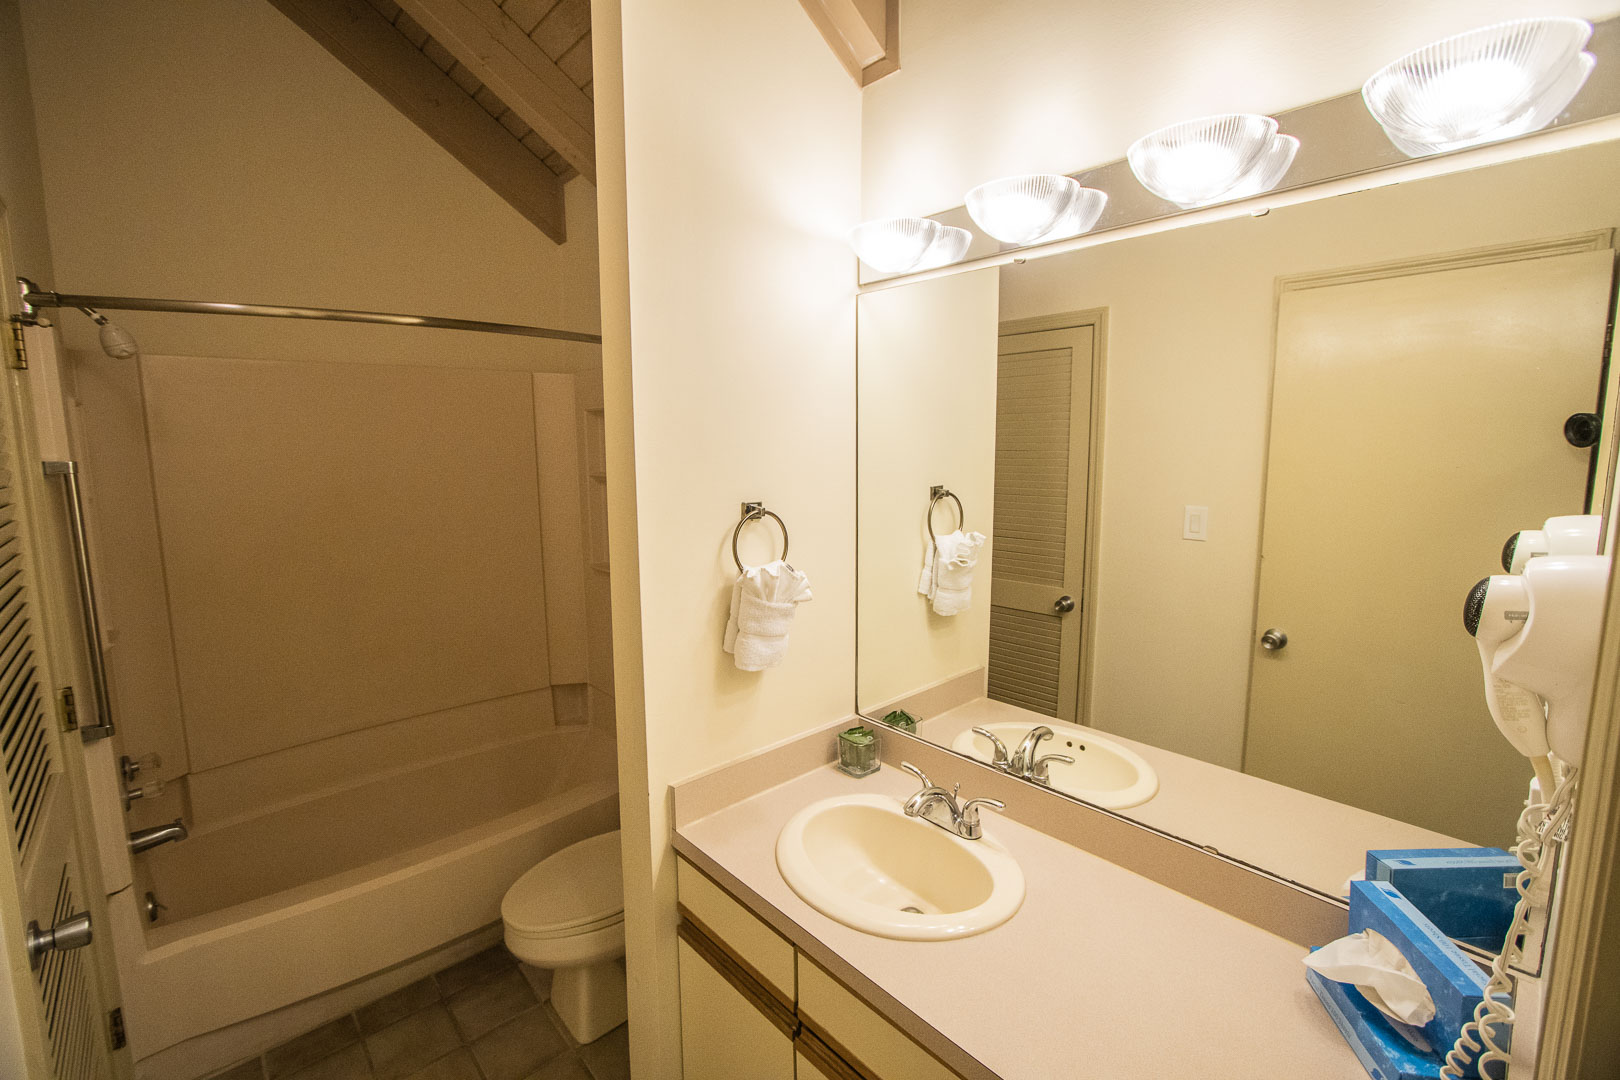 A crisp clean bathroom at VRI's Sandcastle Cove in New Bern, North Carolina.